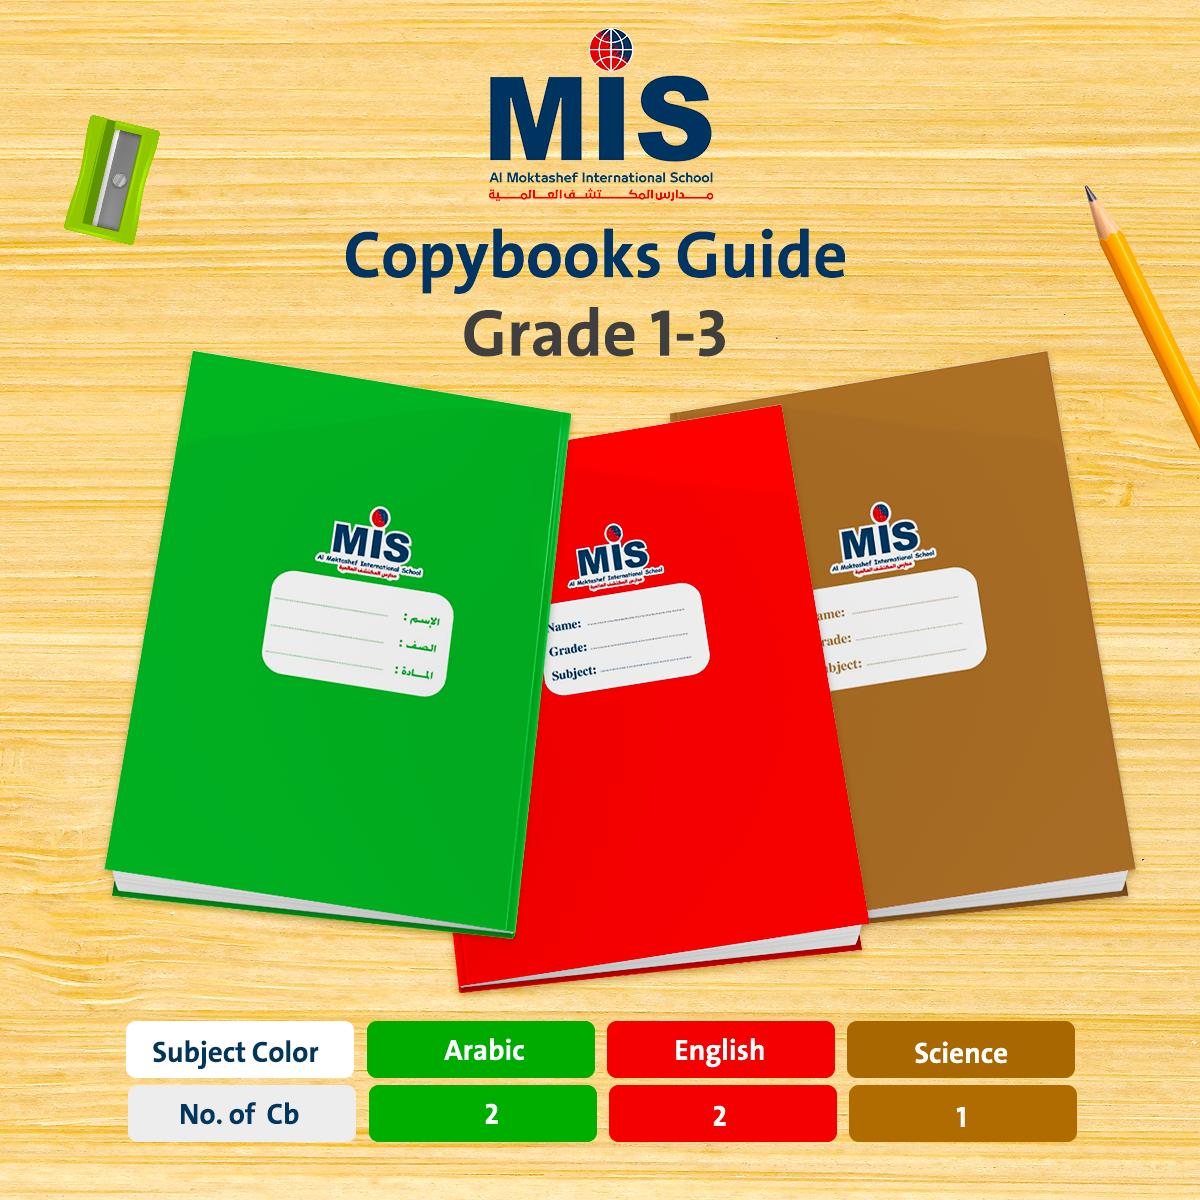 G 1-2-3 Copybooks Guide